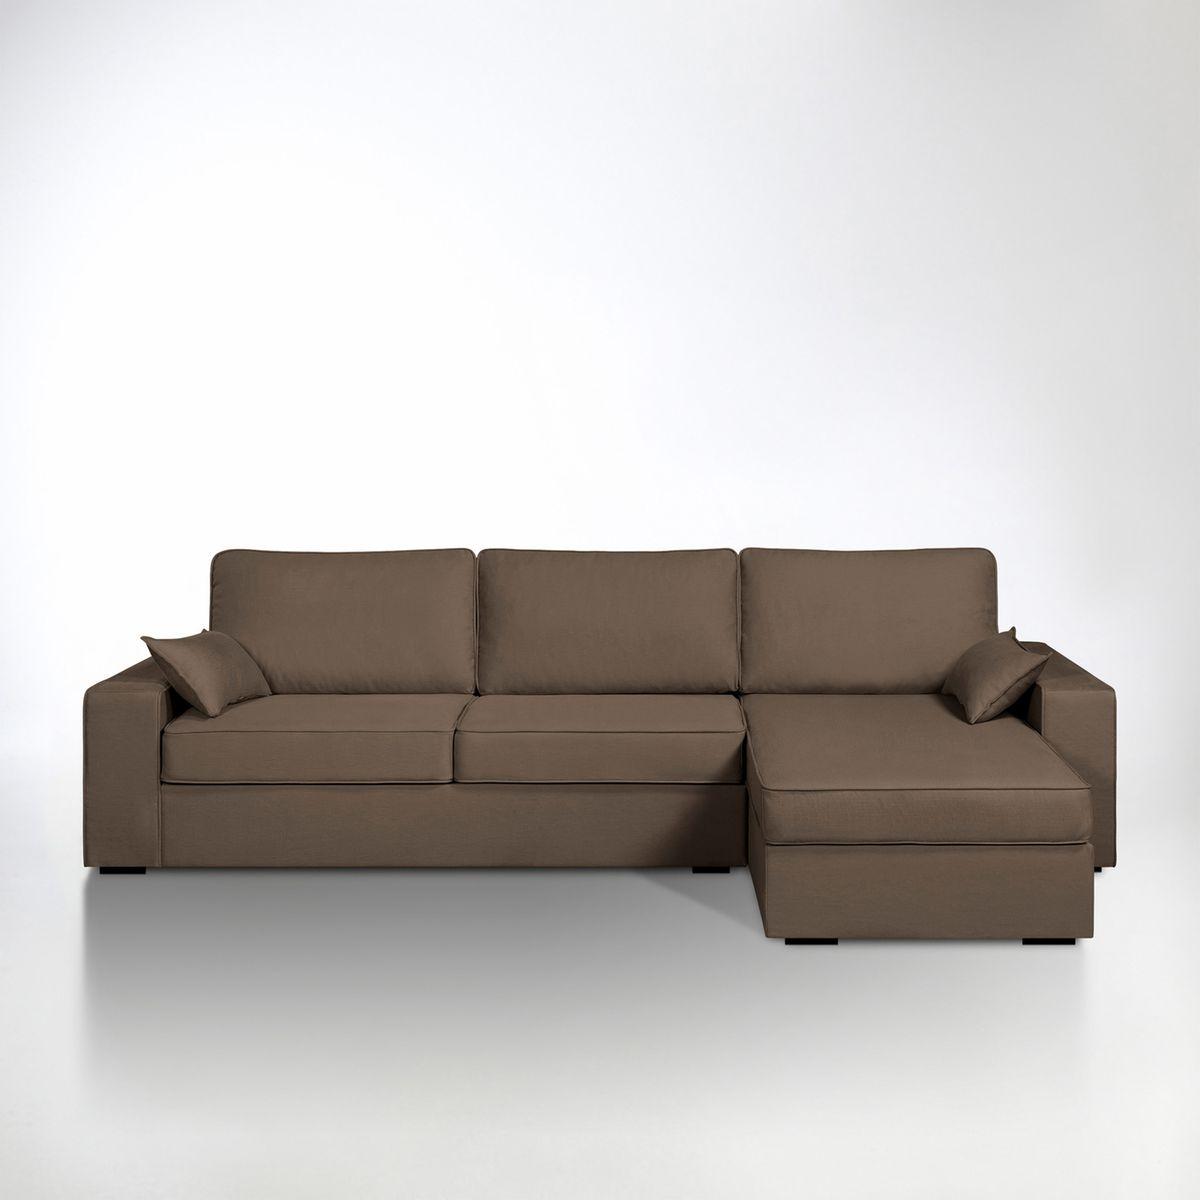 image Canapé d'angle lit, couchage express, coton & lin, La Redoute